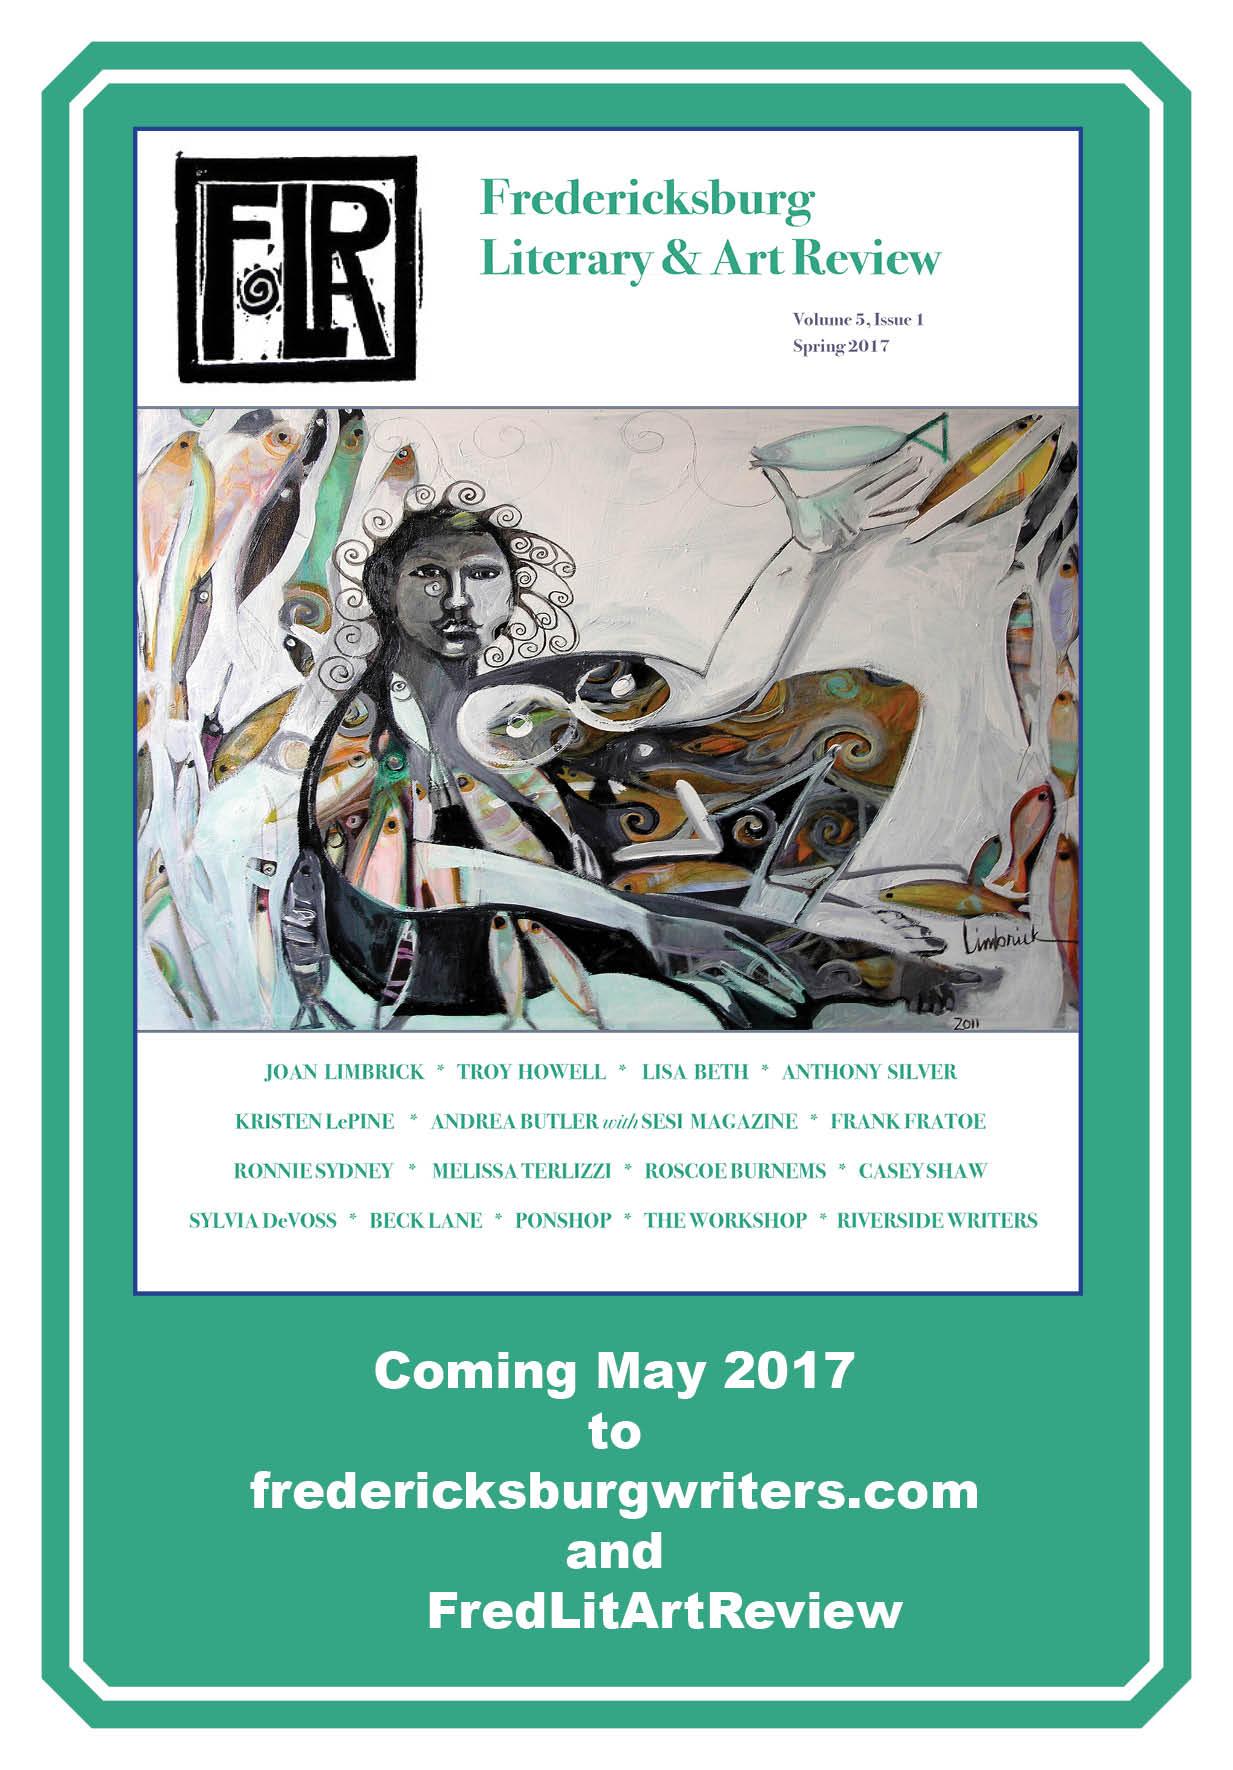 Fredericksburg Literary & Art Review - Volume 5, Issue 1, 2017